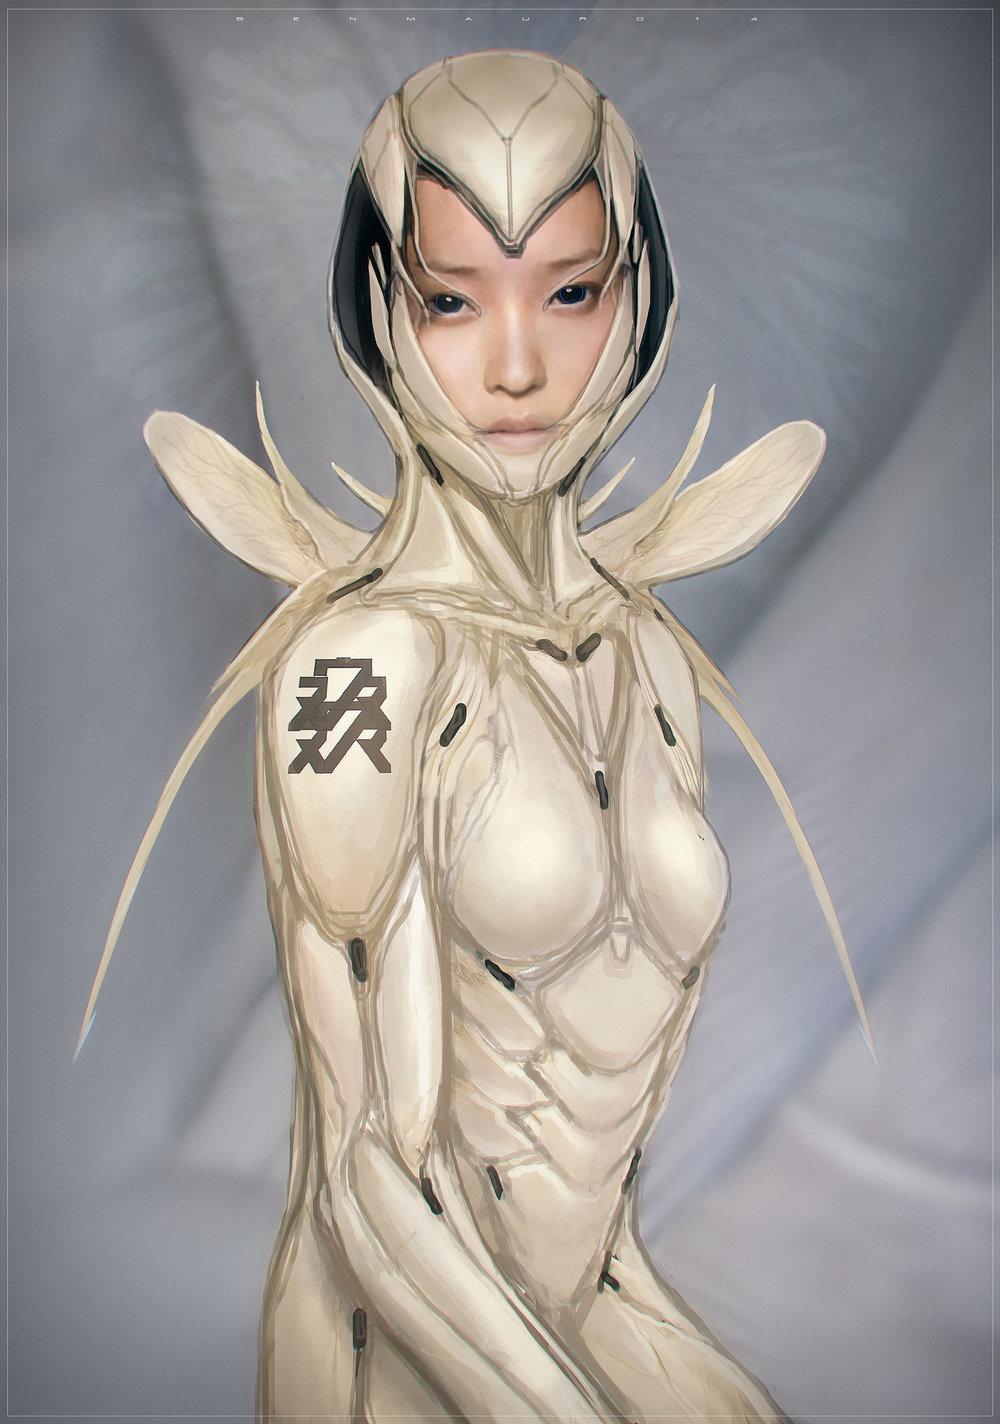 ben-mauro-orchid-04s-bm.jpg